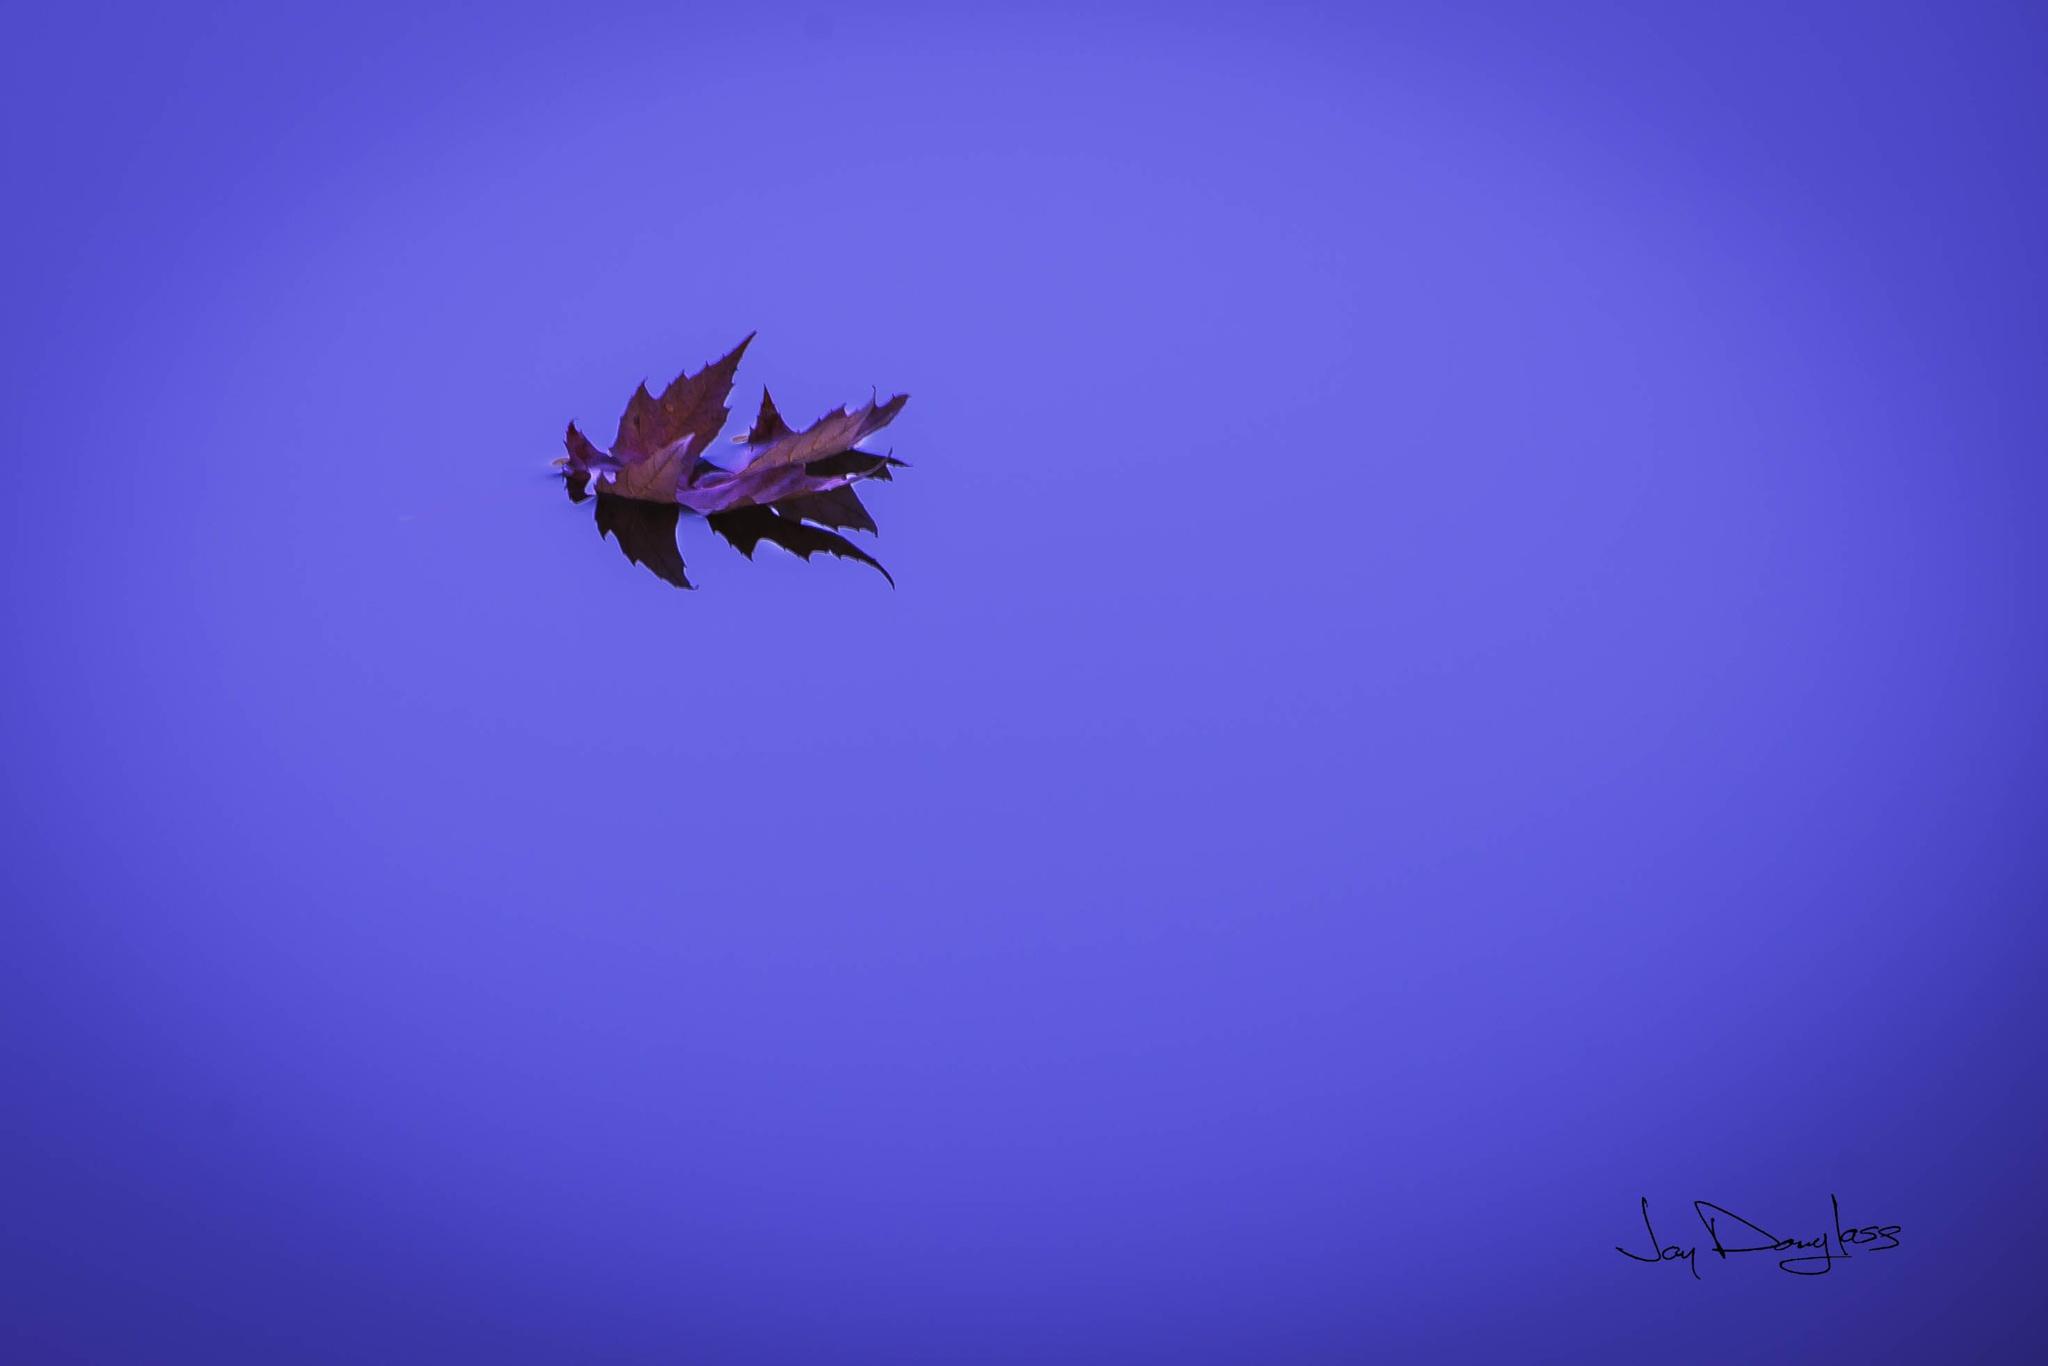 Floating Leaf by Jay Douglass